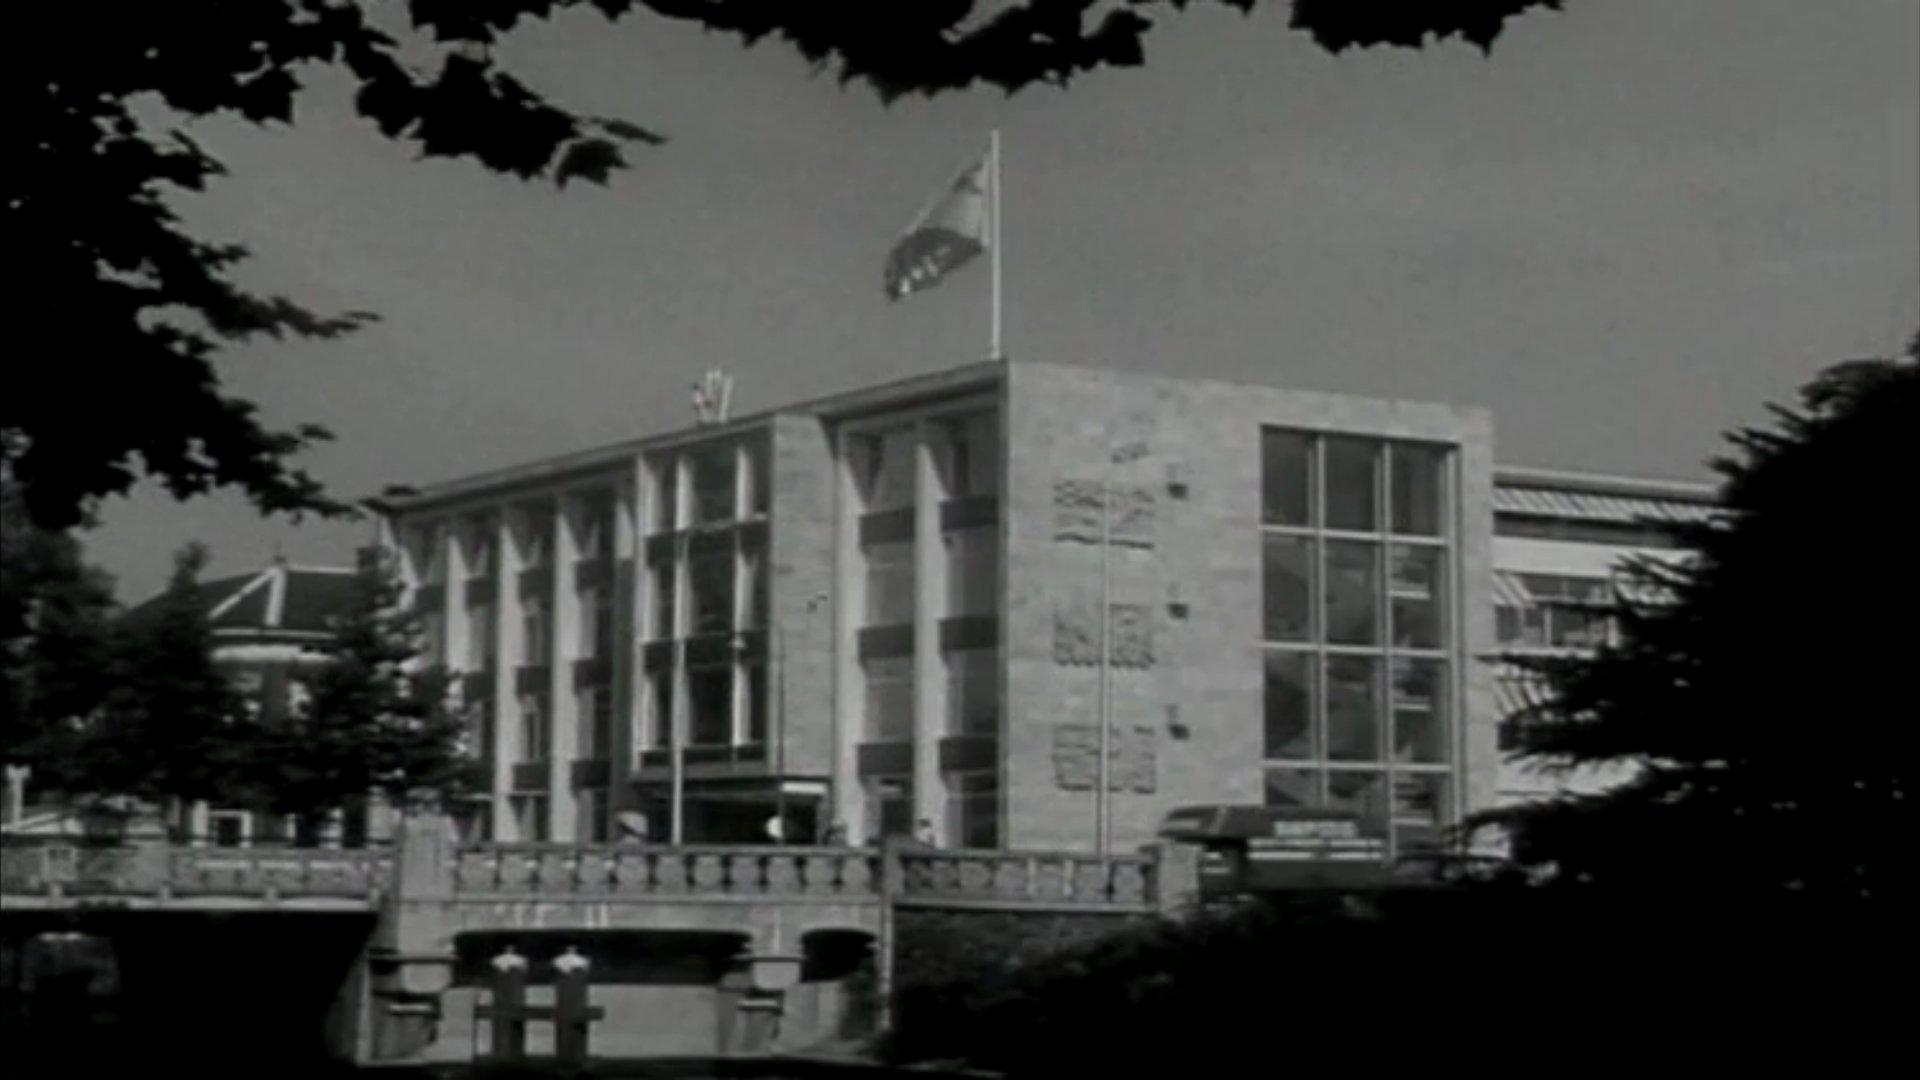 Steenkolen Handels-Vereeniging - SHV